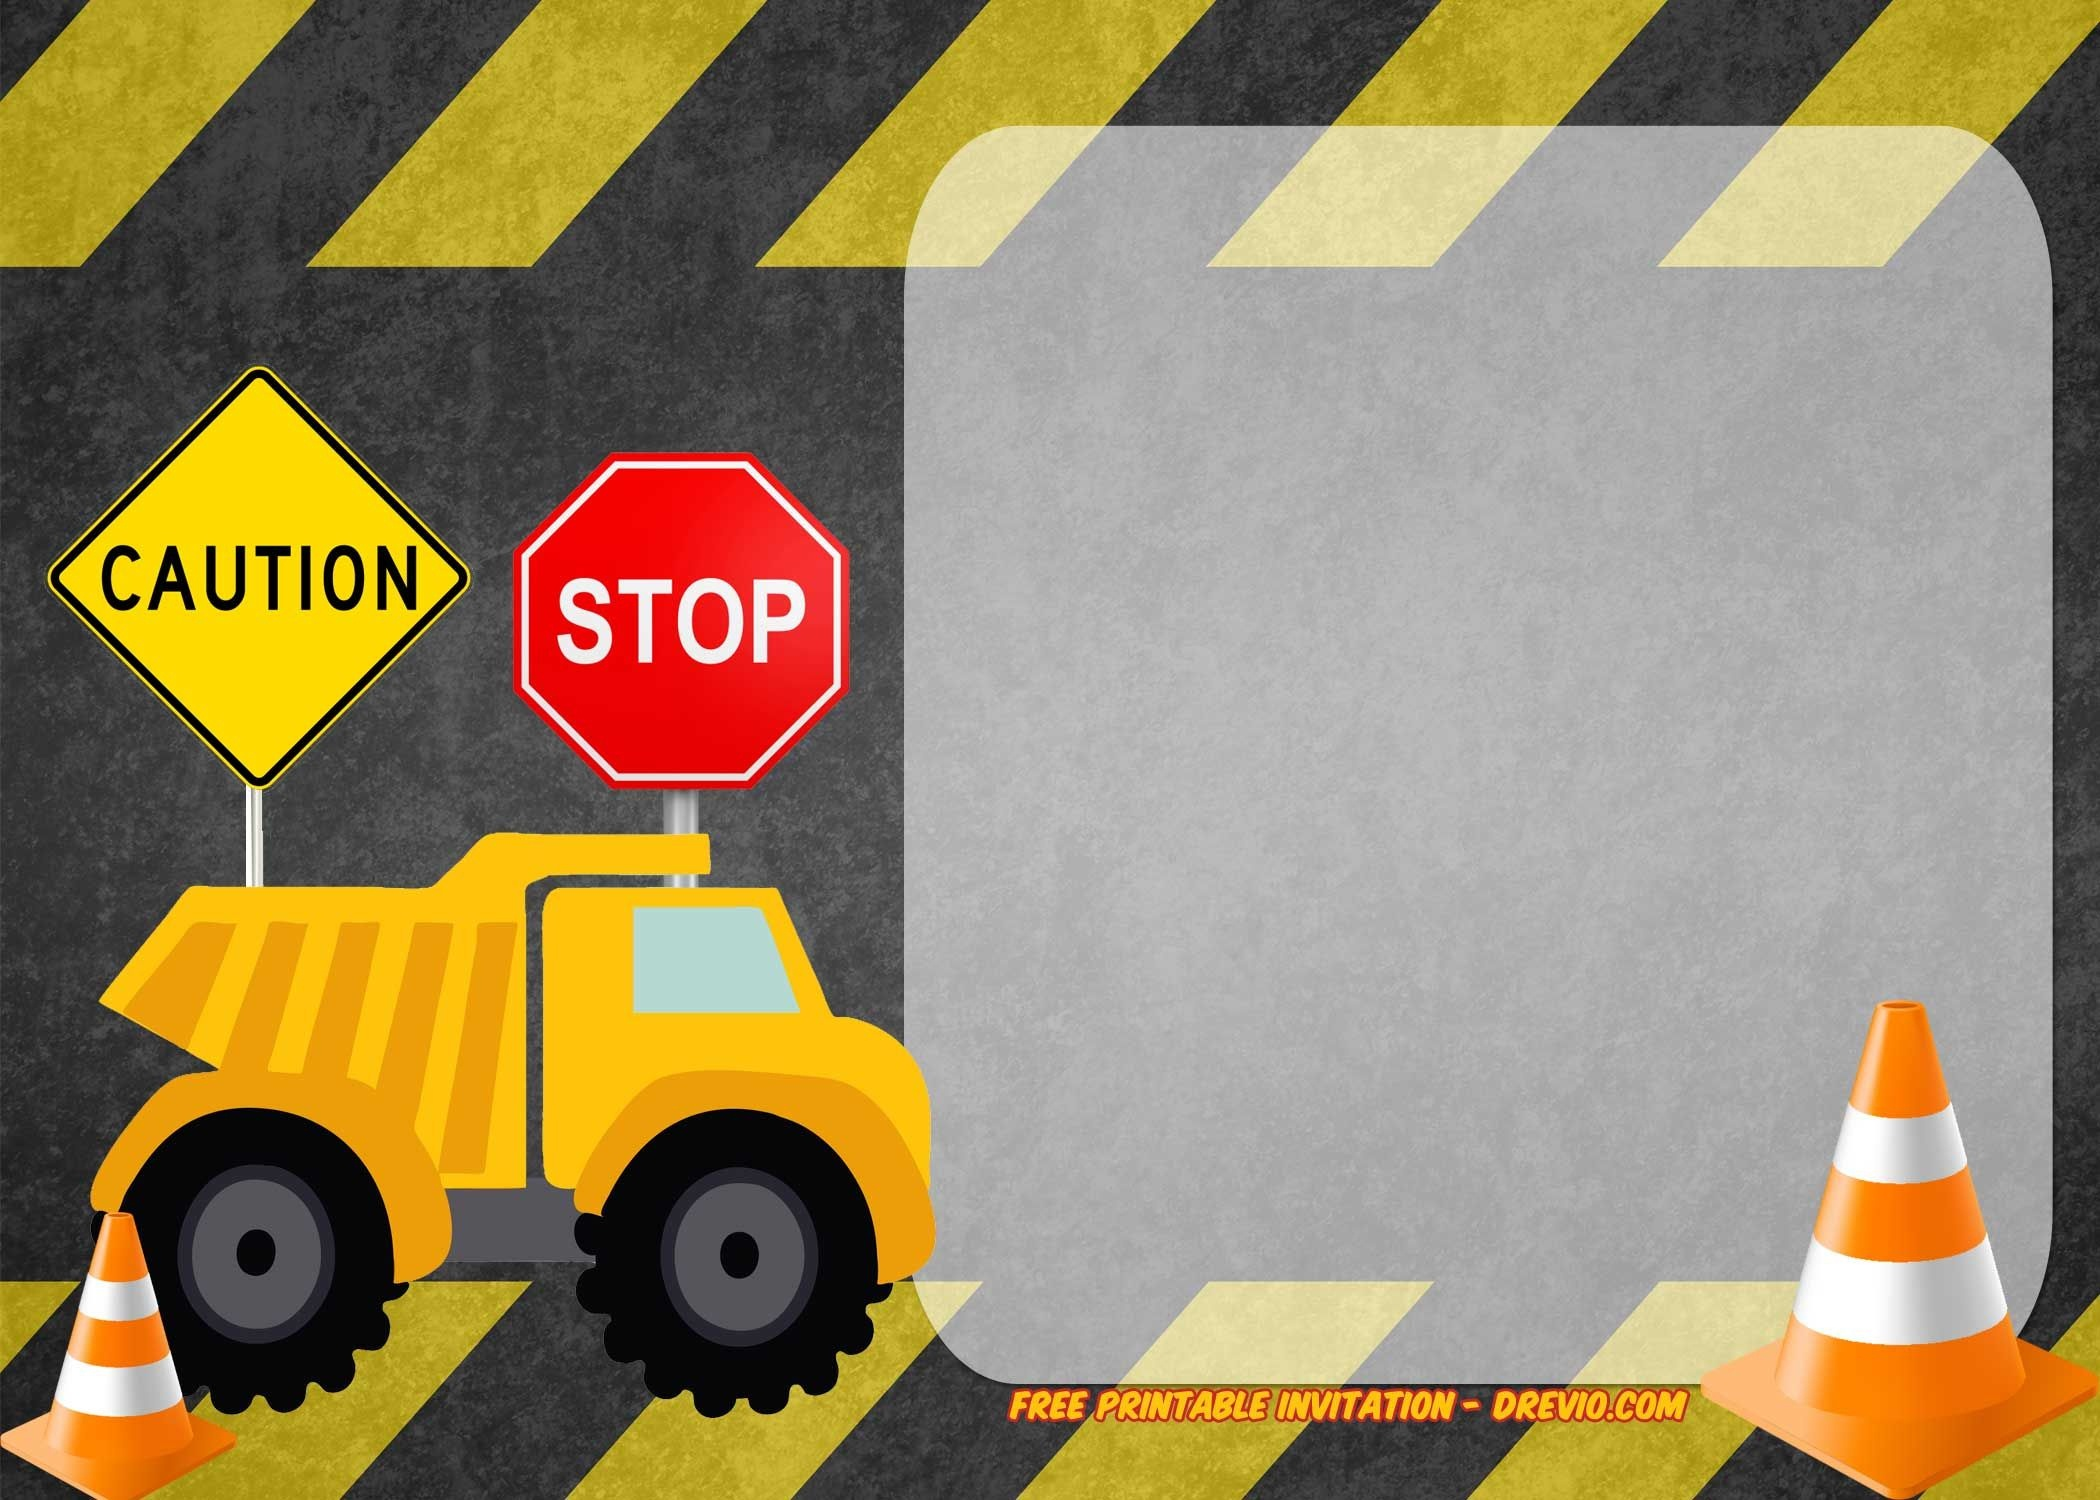 Free Printable Construction Vehicles Birthday Invitation | Party - Free Printable Construction Birthday Invitation Templates